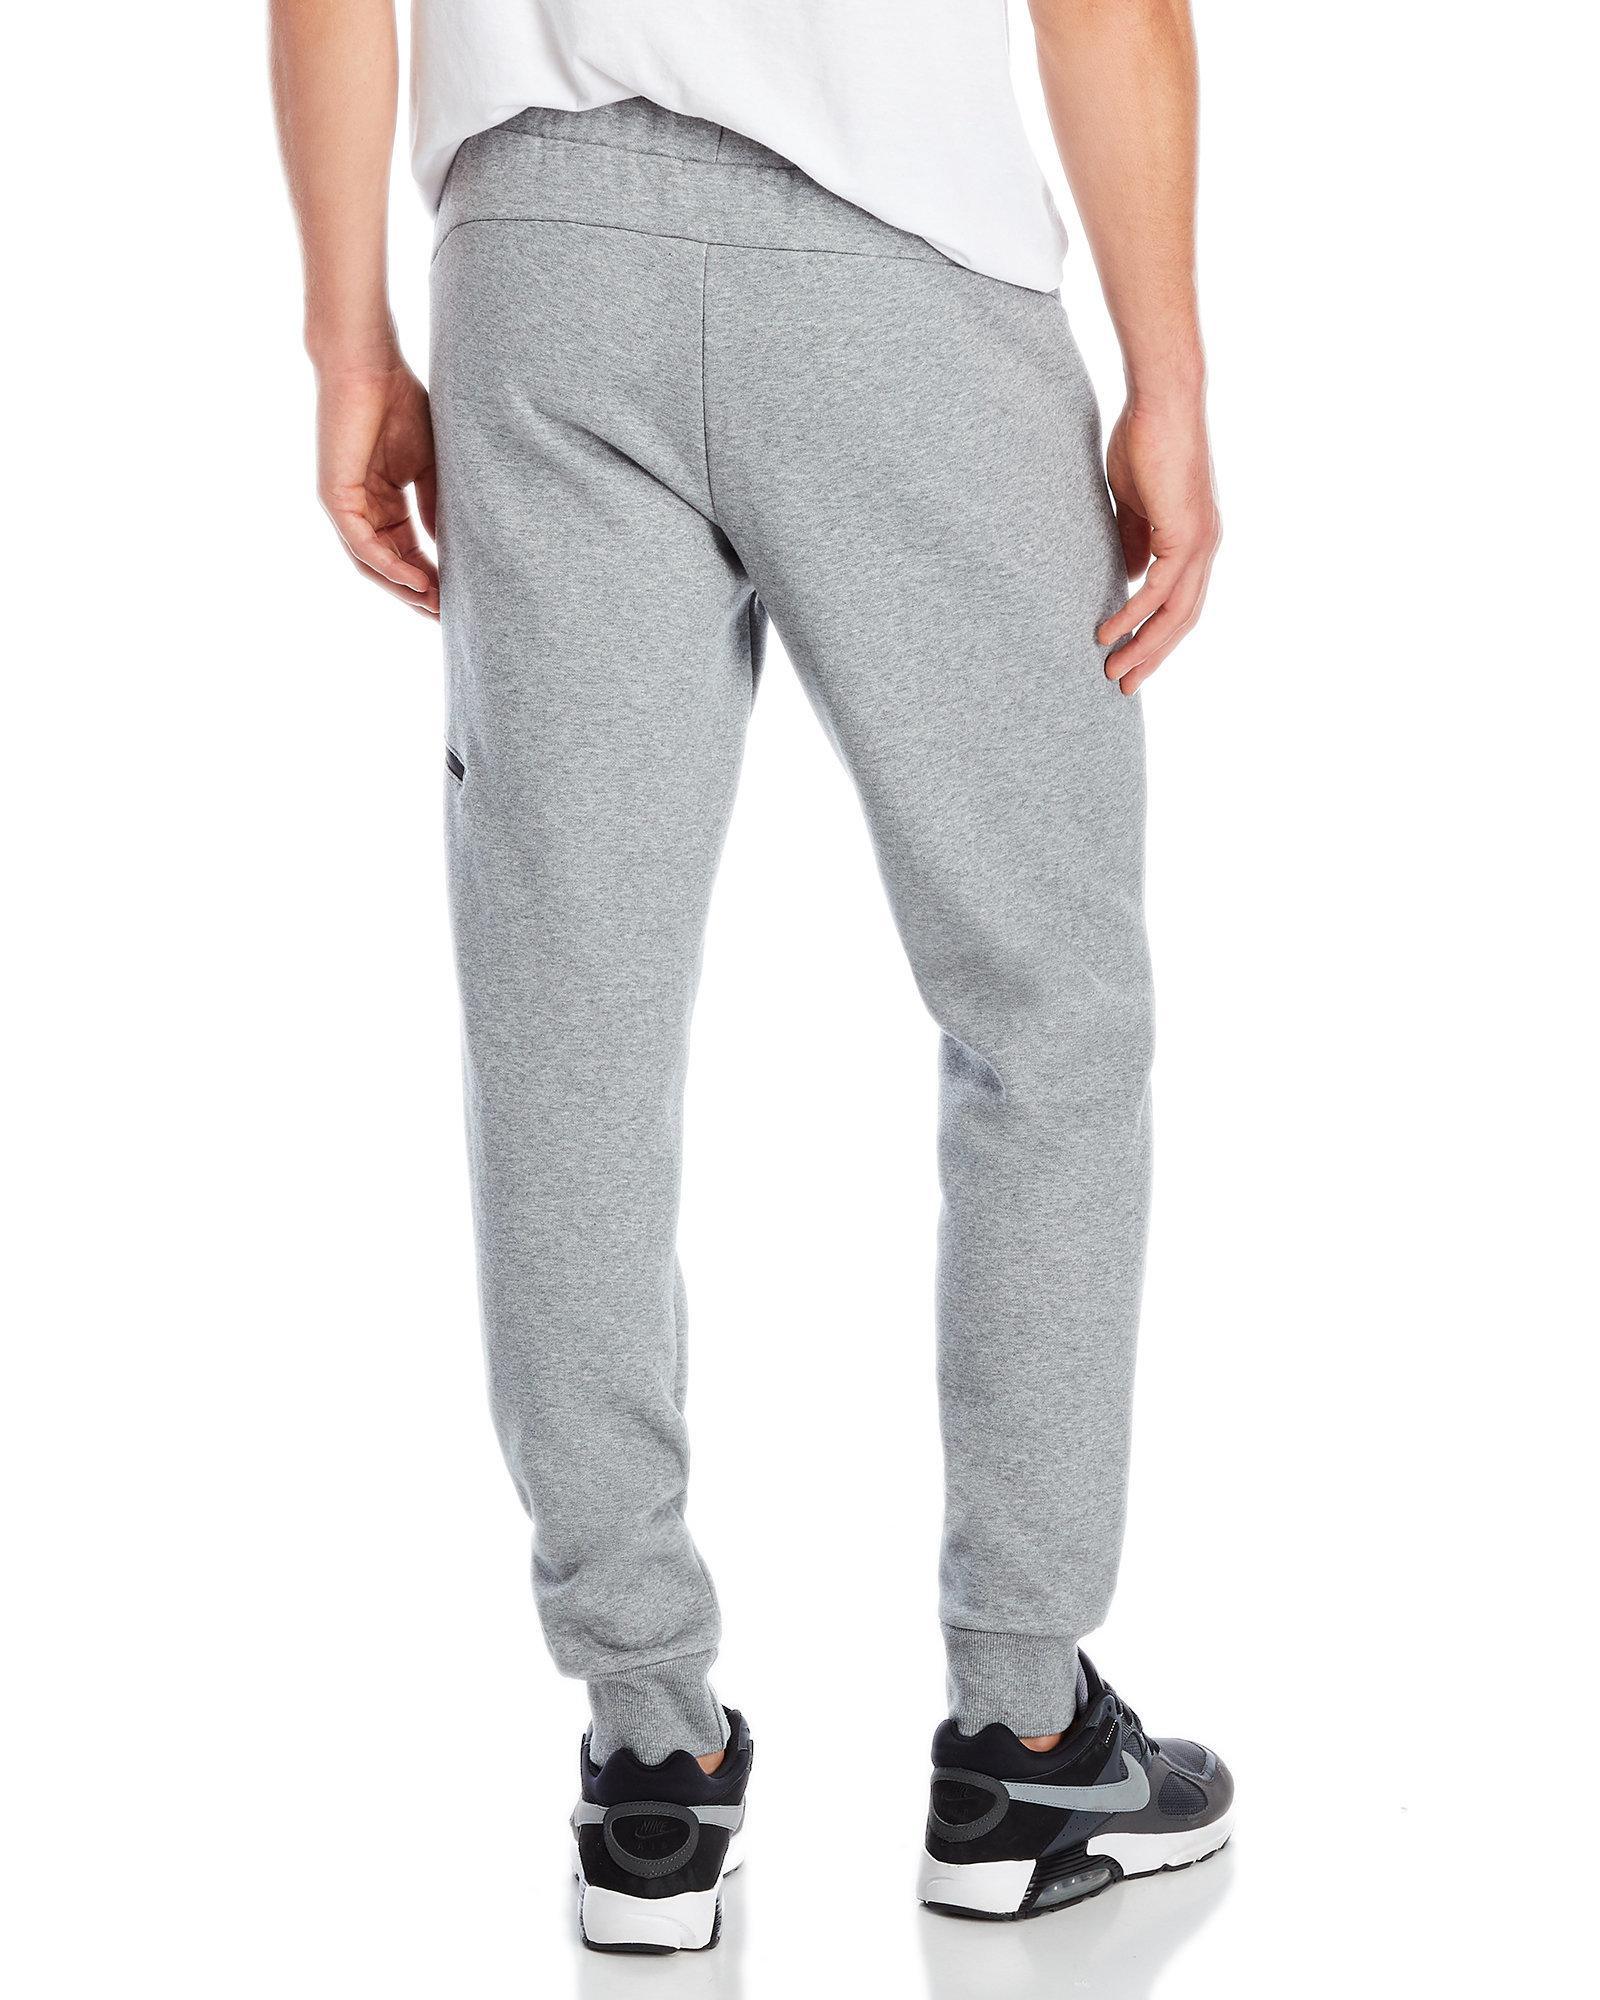 e229c734d 1 Sweat Pants FL Sweatpant Training Pantalon jogging 838264-03 Puma ...